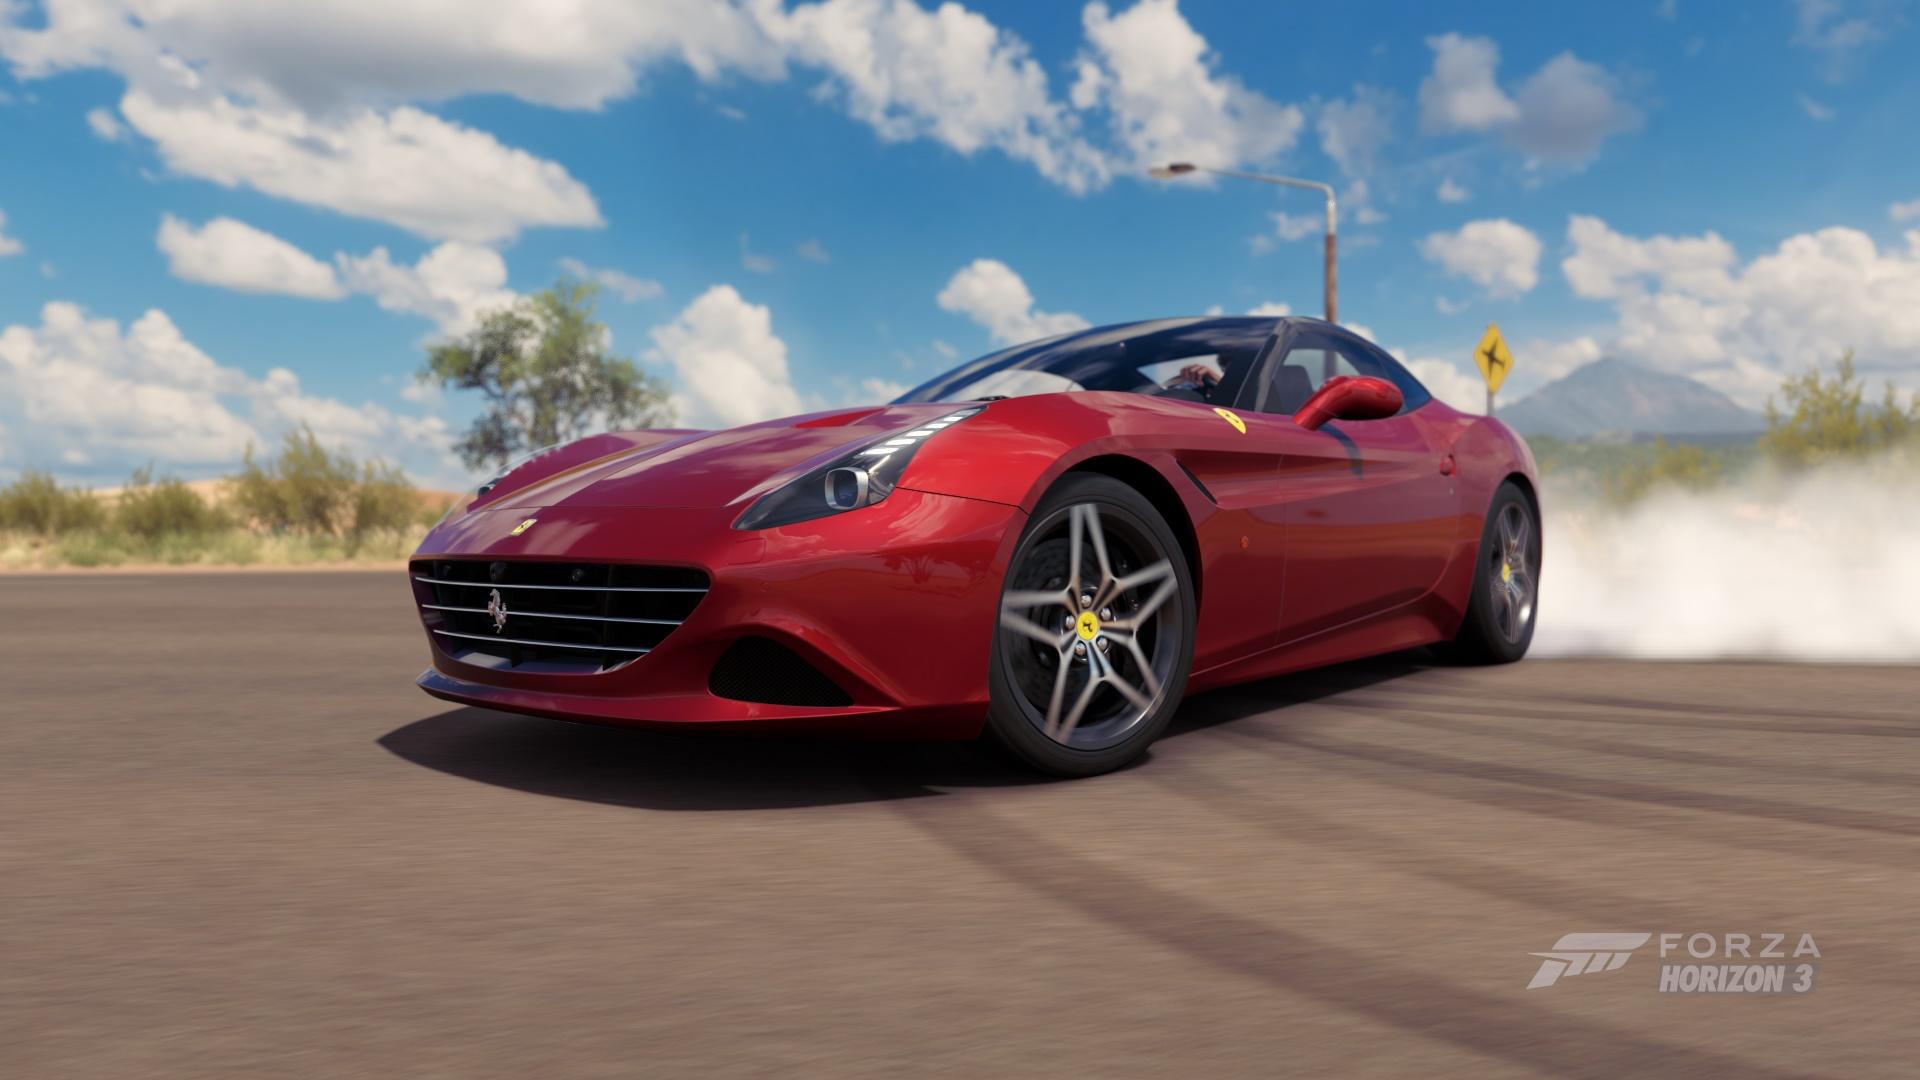 40e339bb-956d-4c4a-a96f-c9b63c8679b9.jpg?n=2014%20Ferrari%20California%20T%20C4PT41N%20SL0W Fabulous Ferrari Mondial 8 Super Elite Cars Trend